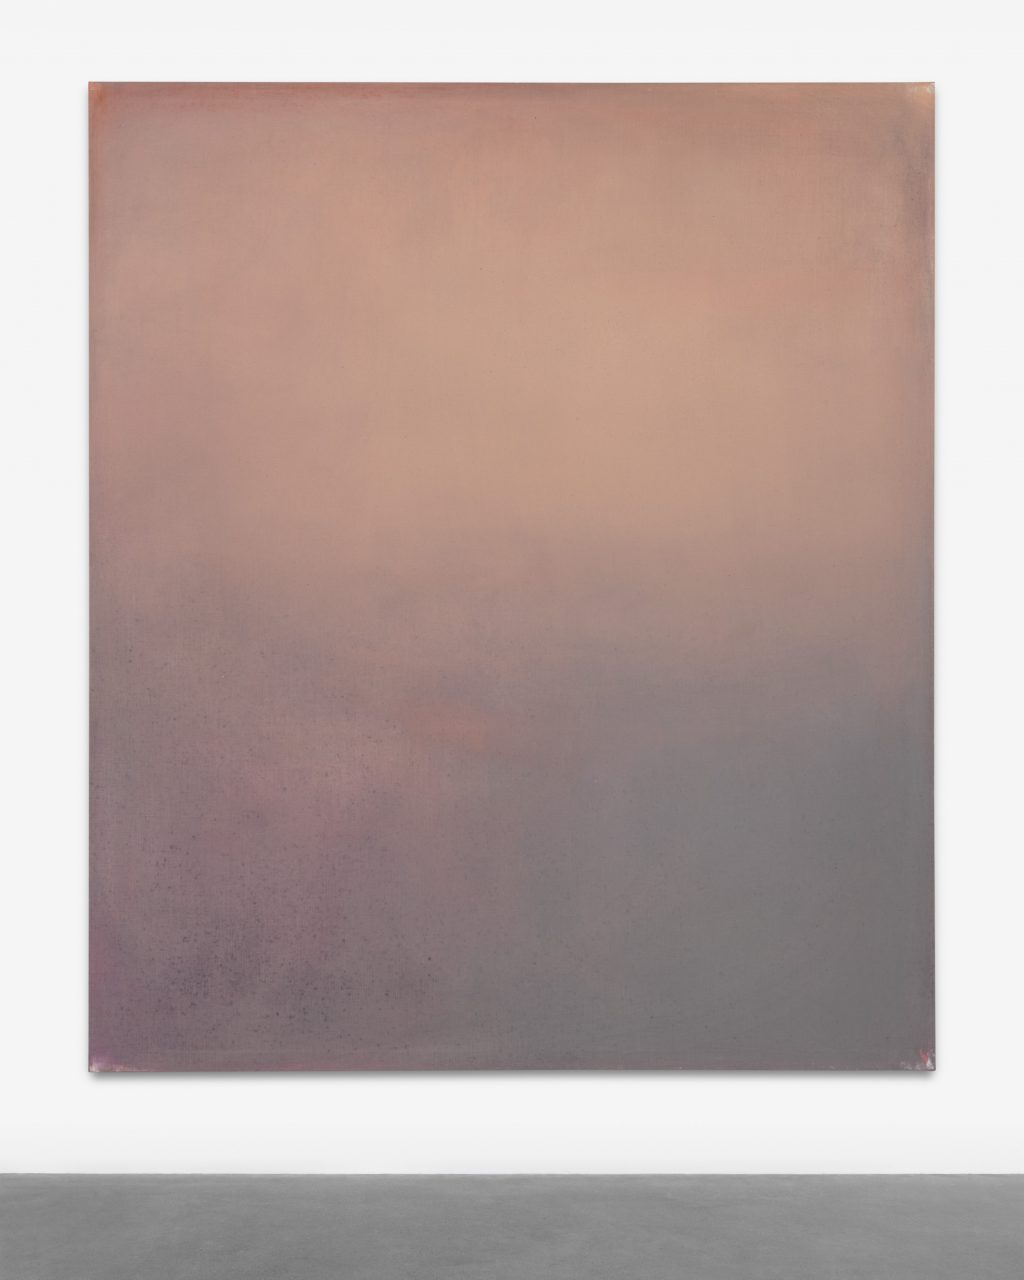 Rover 2019 210x180cm oil on canvas